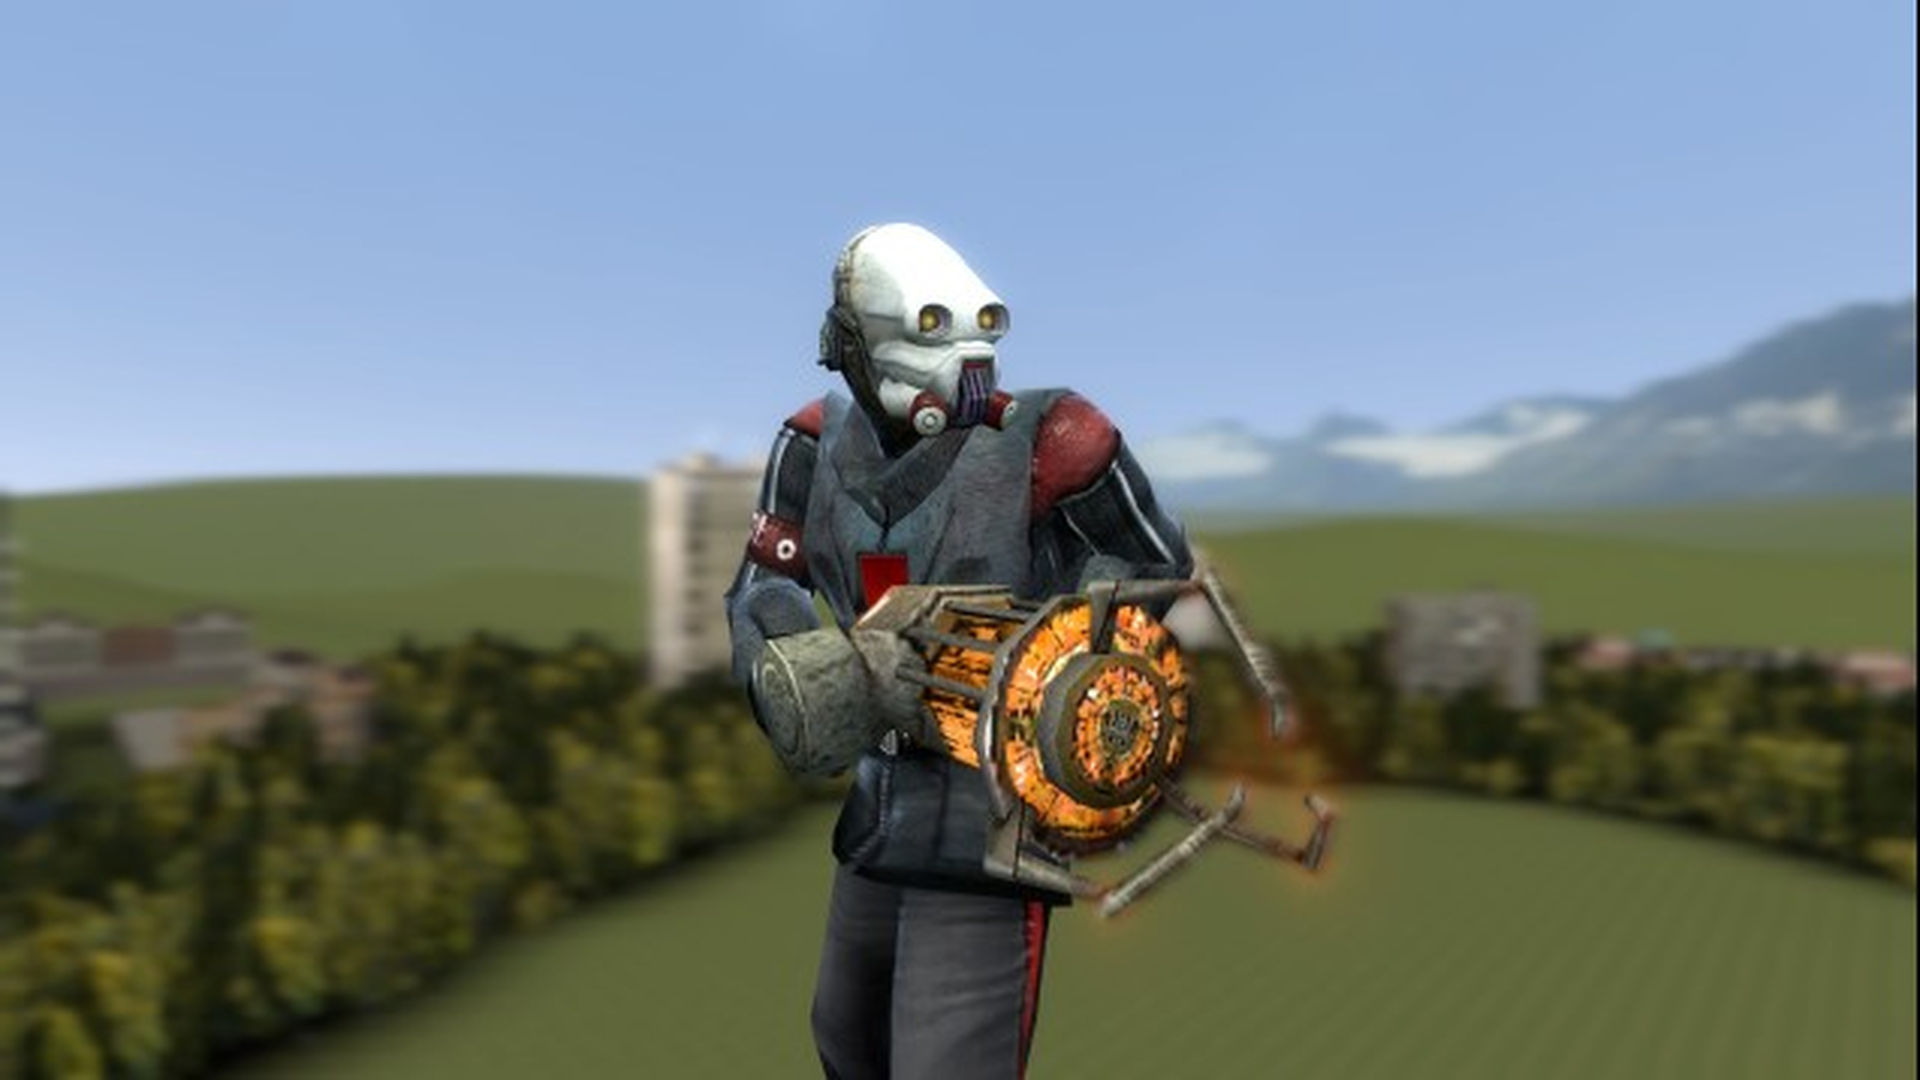 Elite Metro-cop Playermodel   SGM Community (Serious GMod)